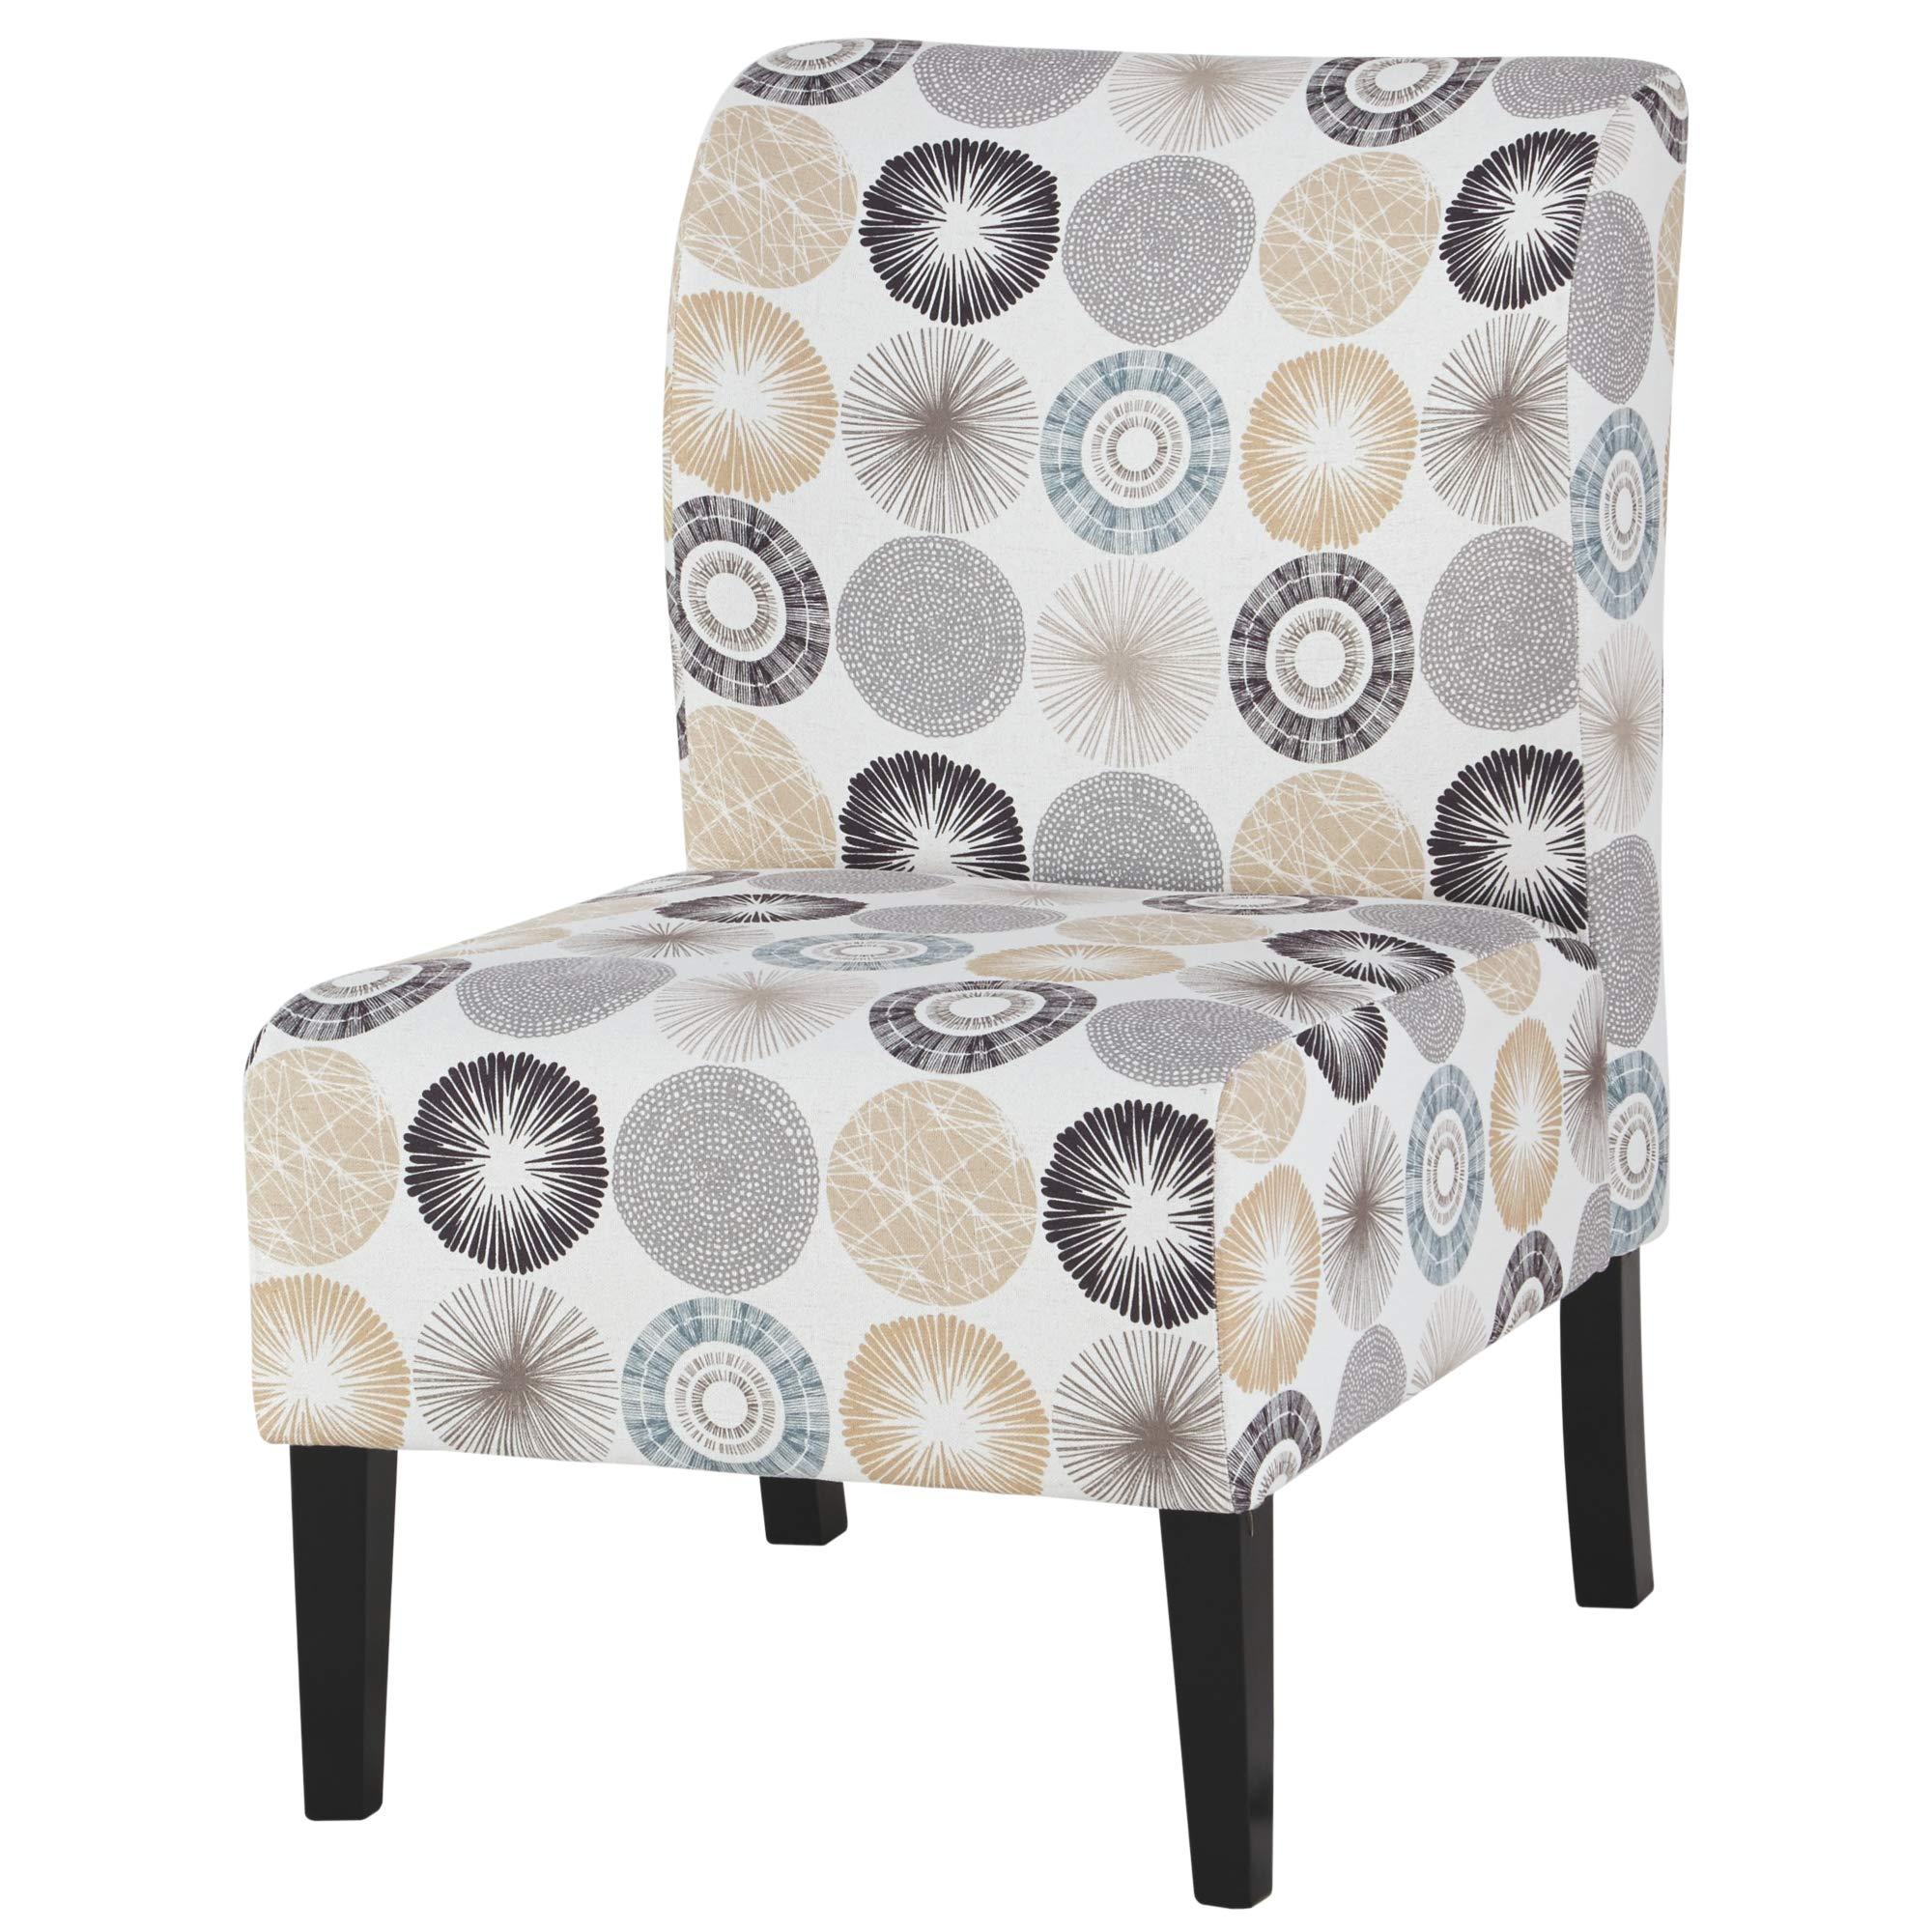 Ashley Furniture Signature Design - Triptis Accent Chair - Contemporary - Gray/Tan Geometric Design - Dark Brown Legs by Signature Design by Ashley